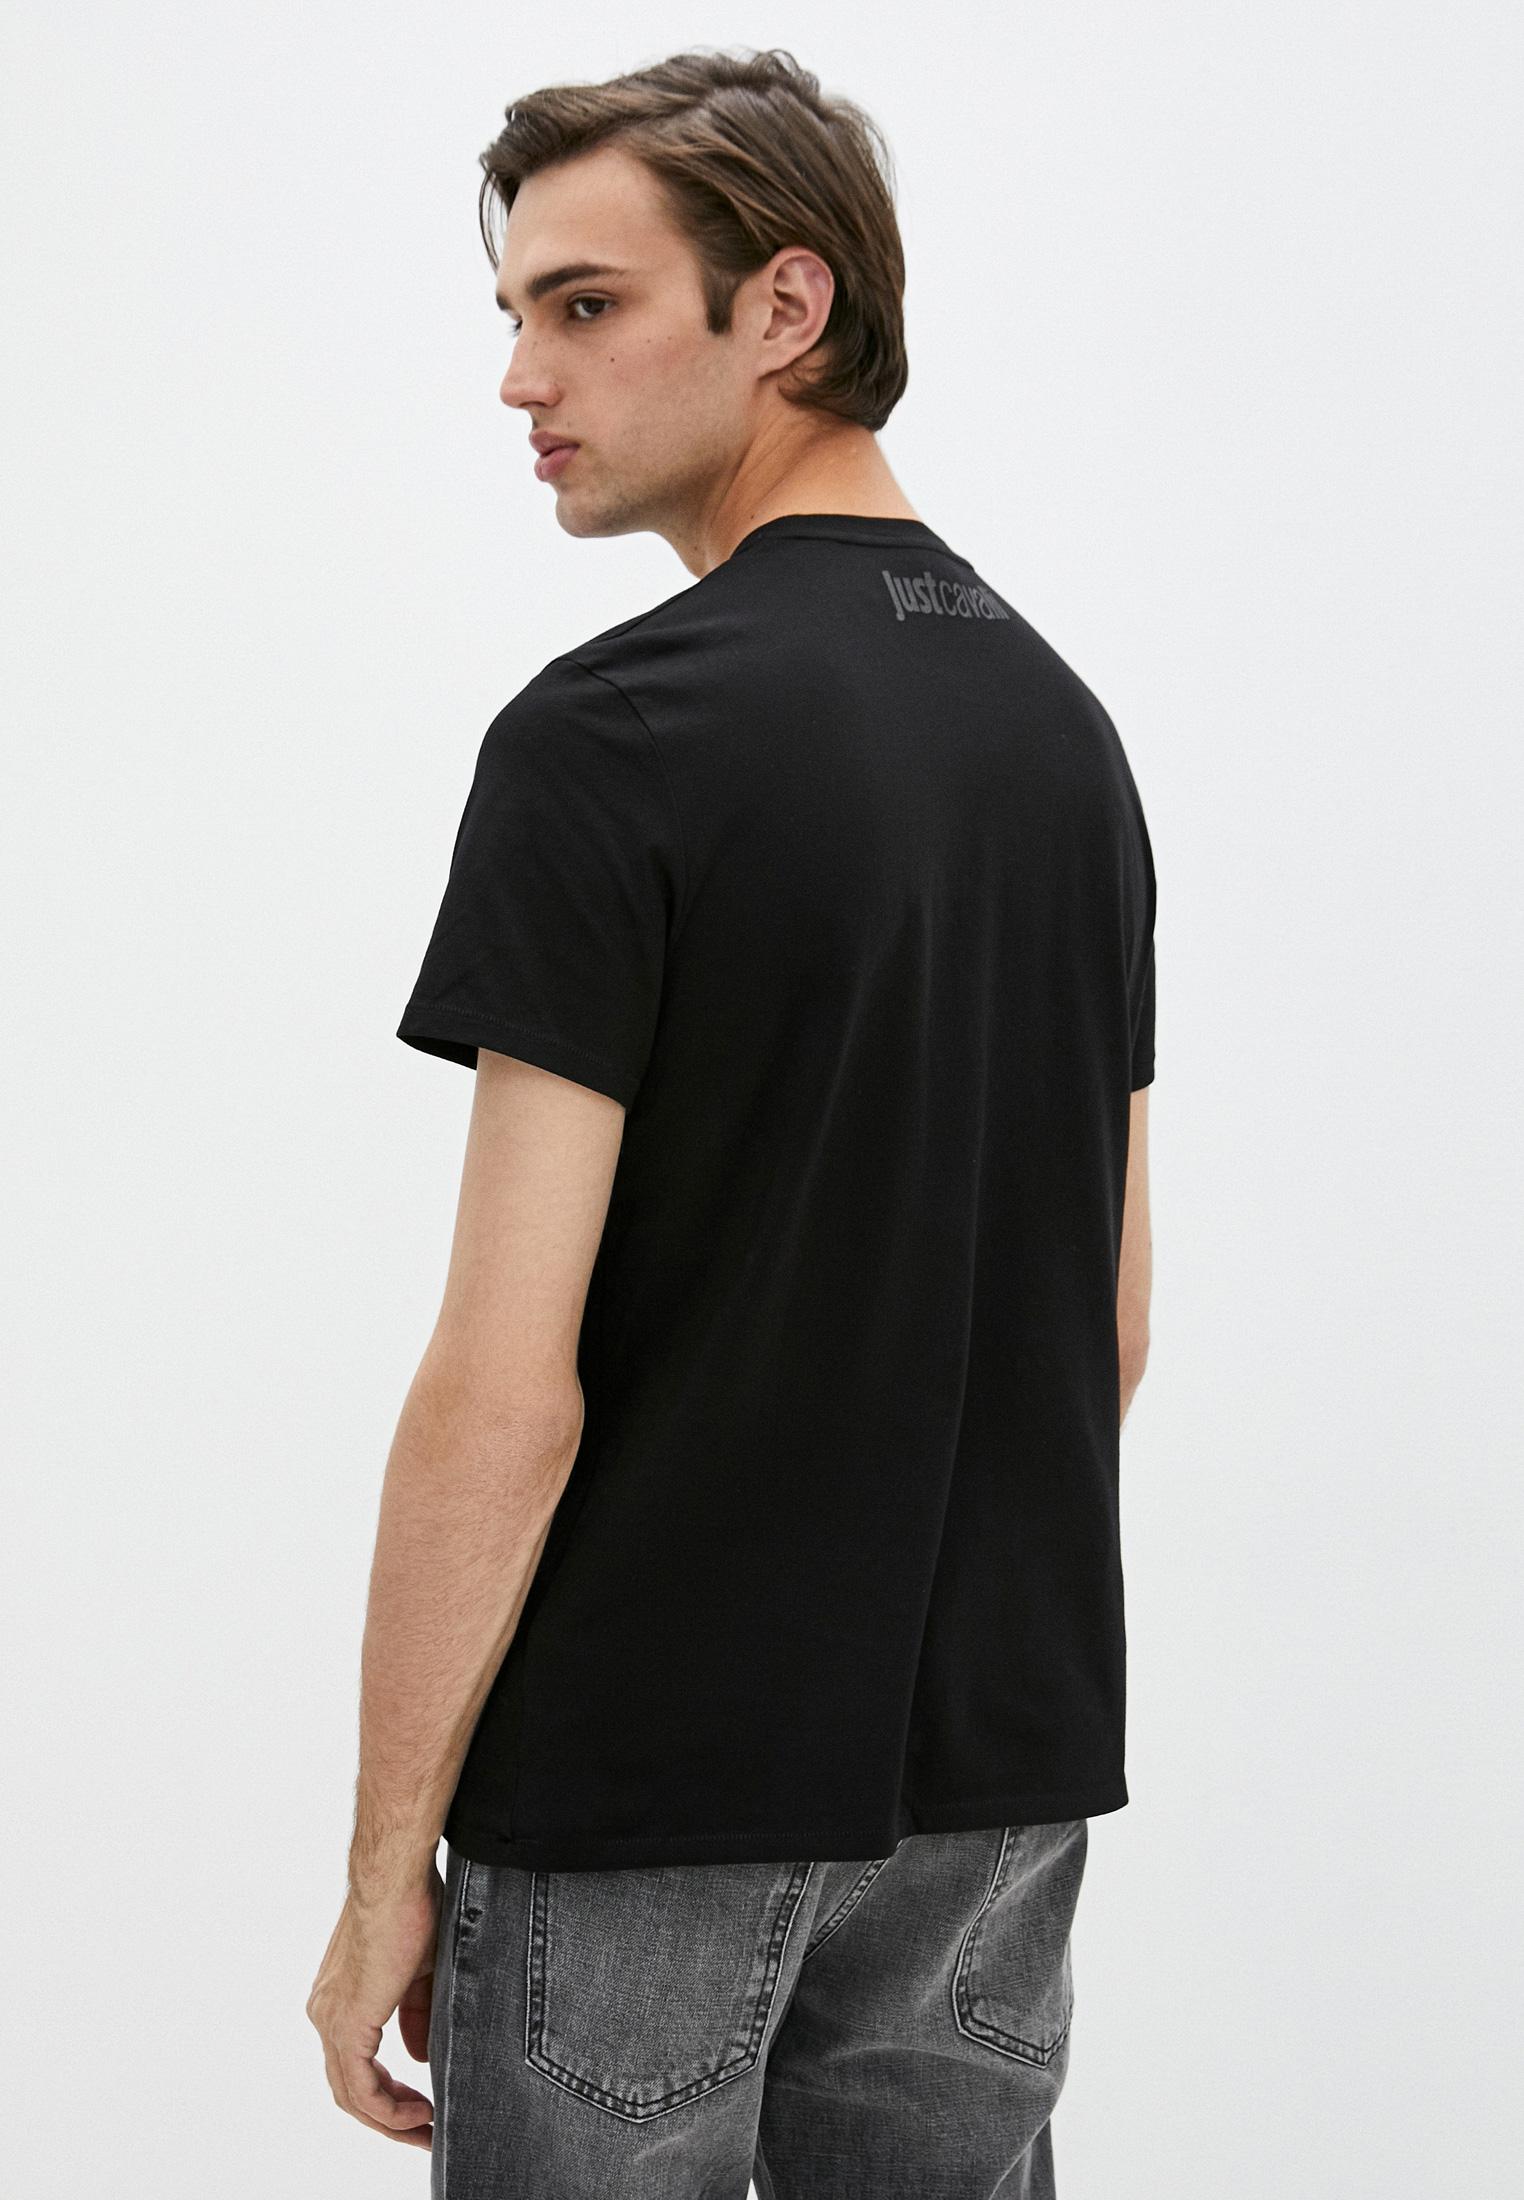 Мужская футболка Just Cavalli (Джаст Кавалли) S01GC0554 N20663: изображение 4